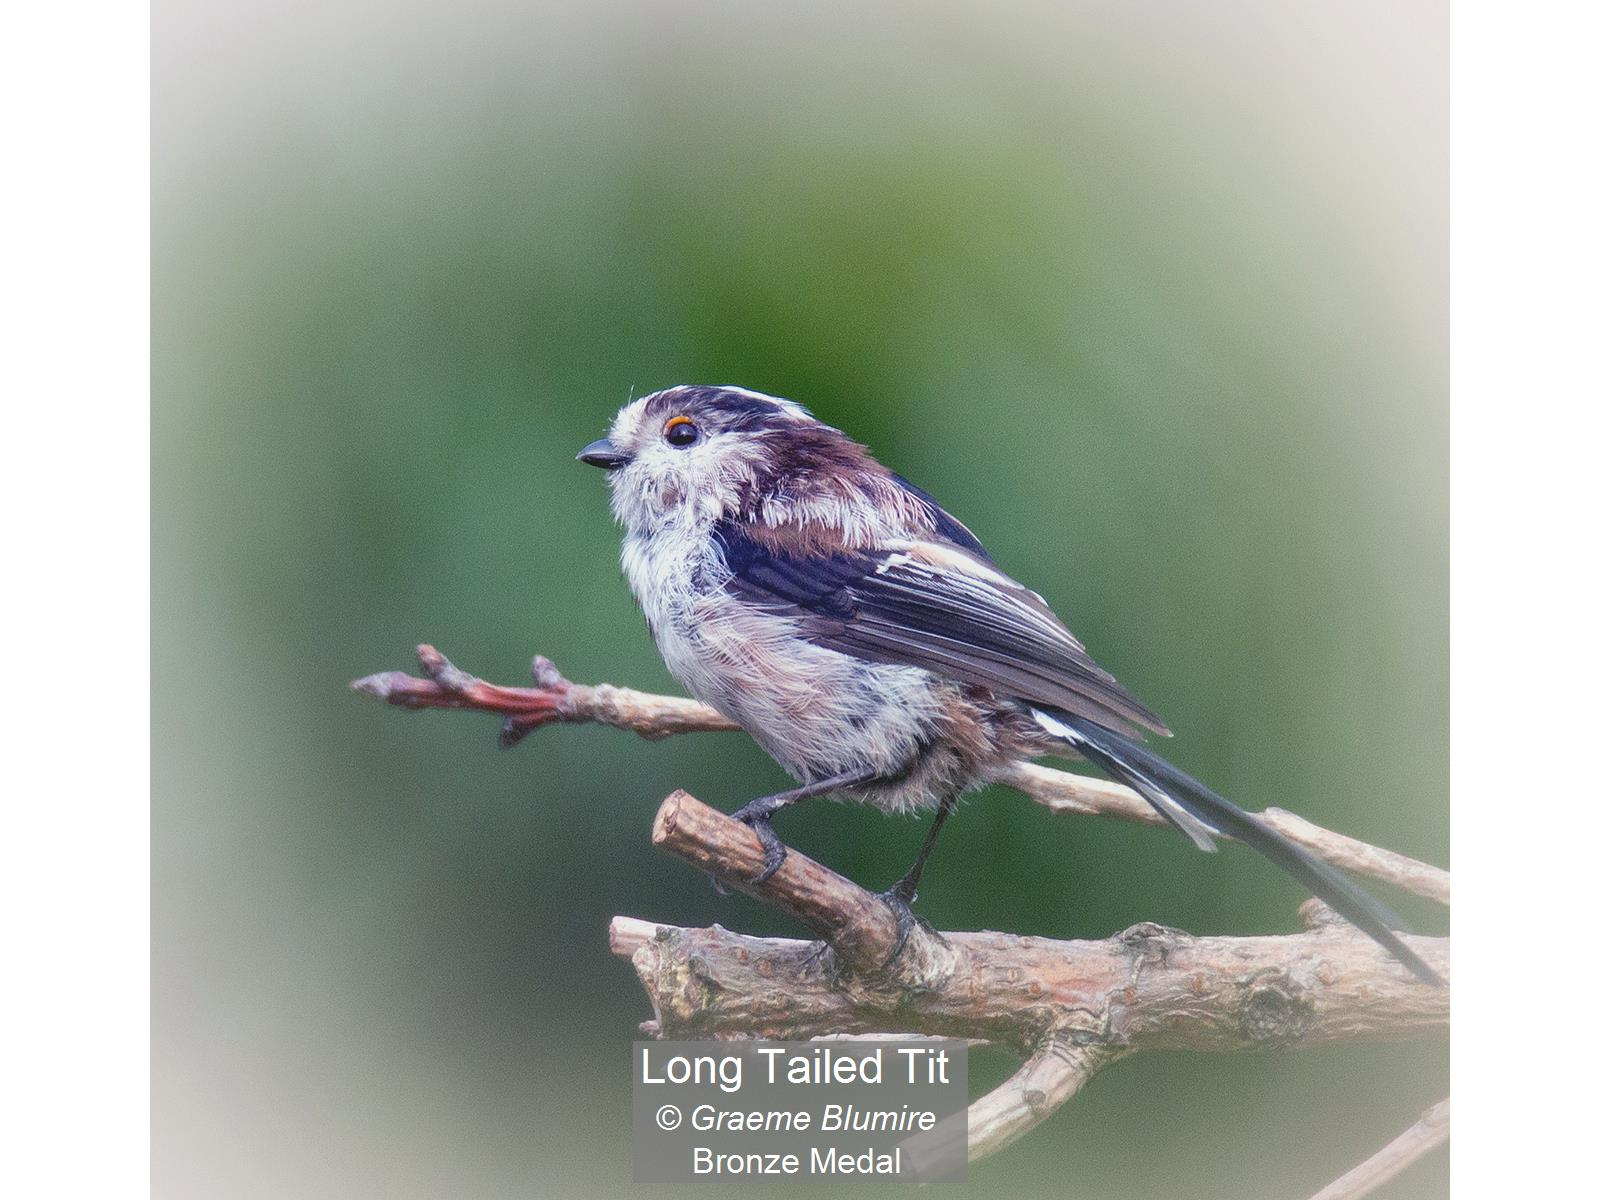 Long Tailed Tit_Graeme Blumire_Bronze